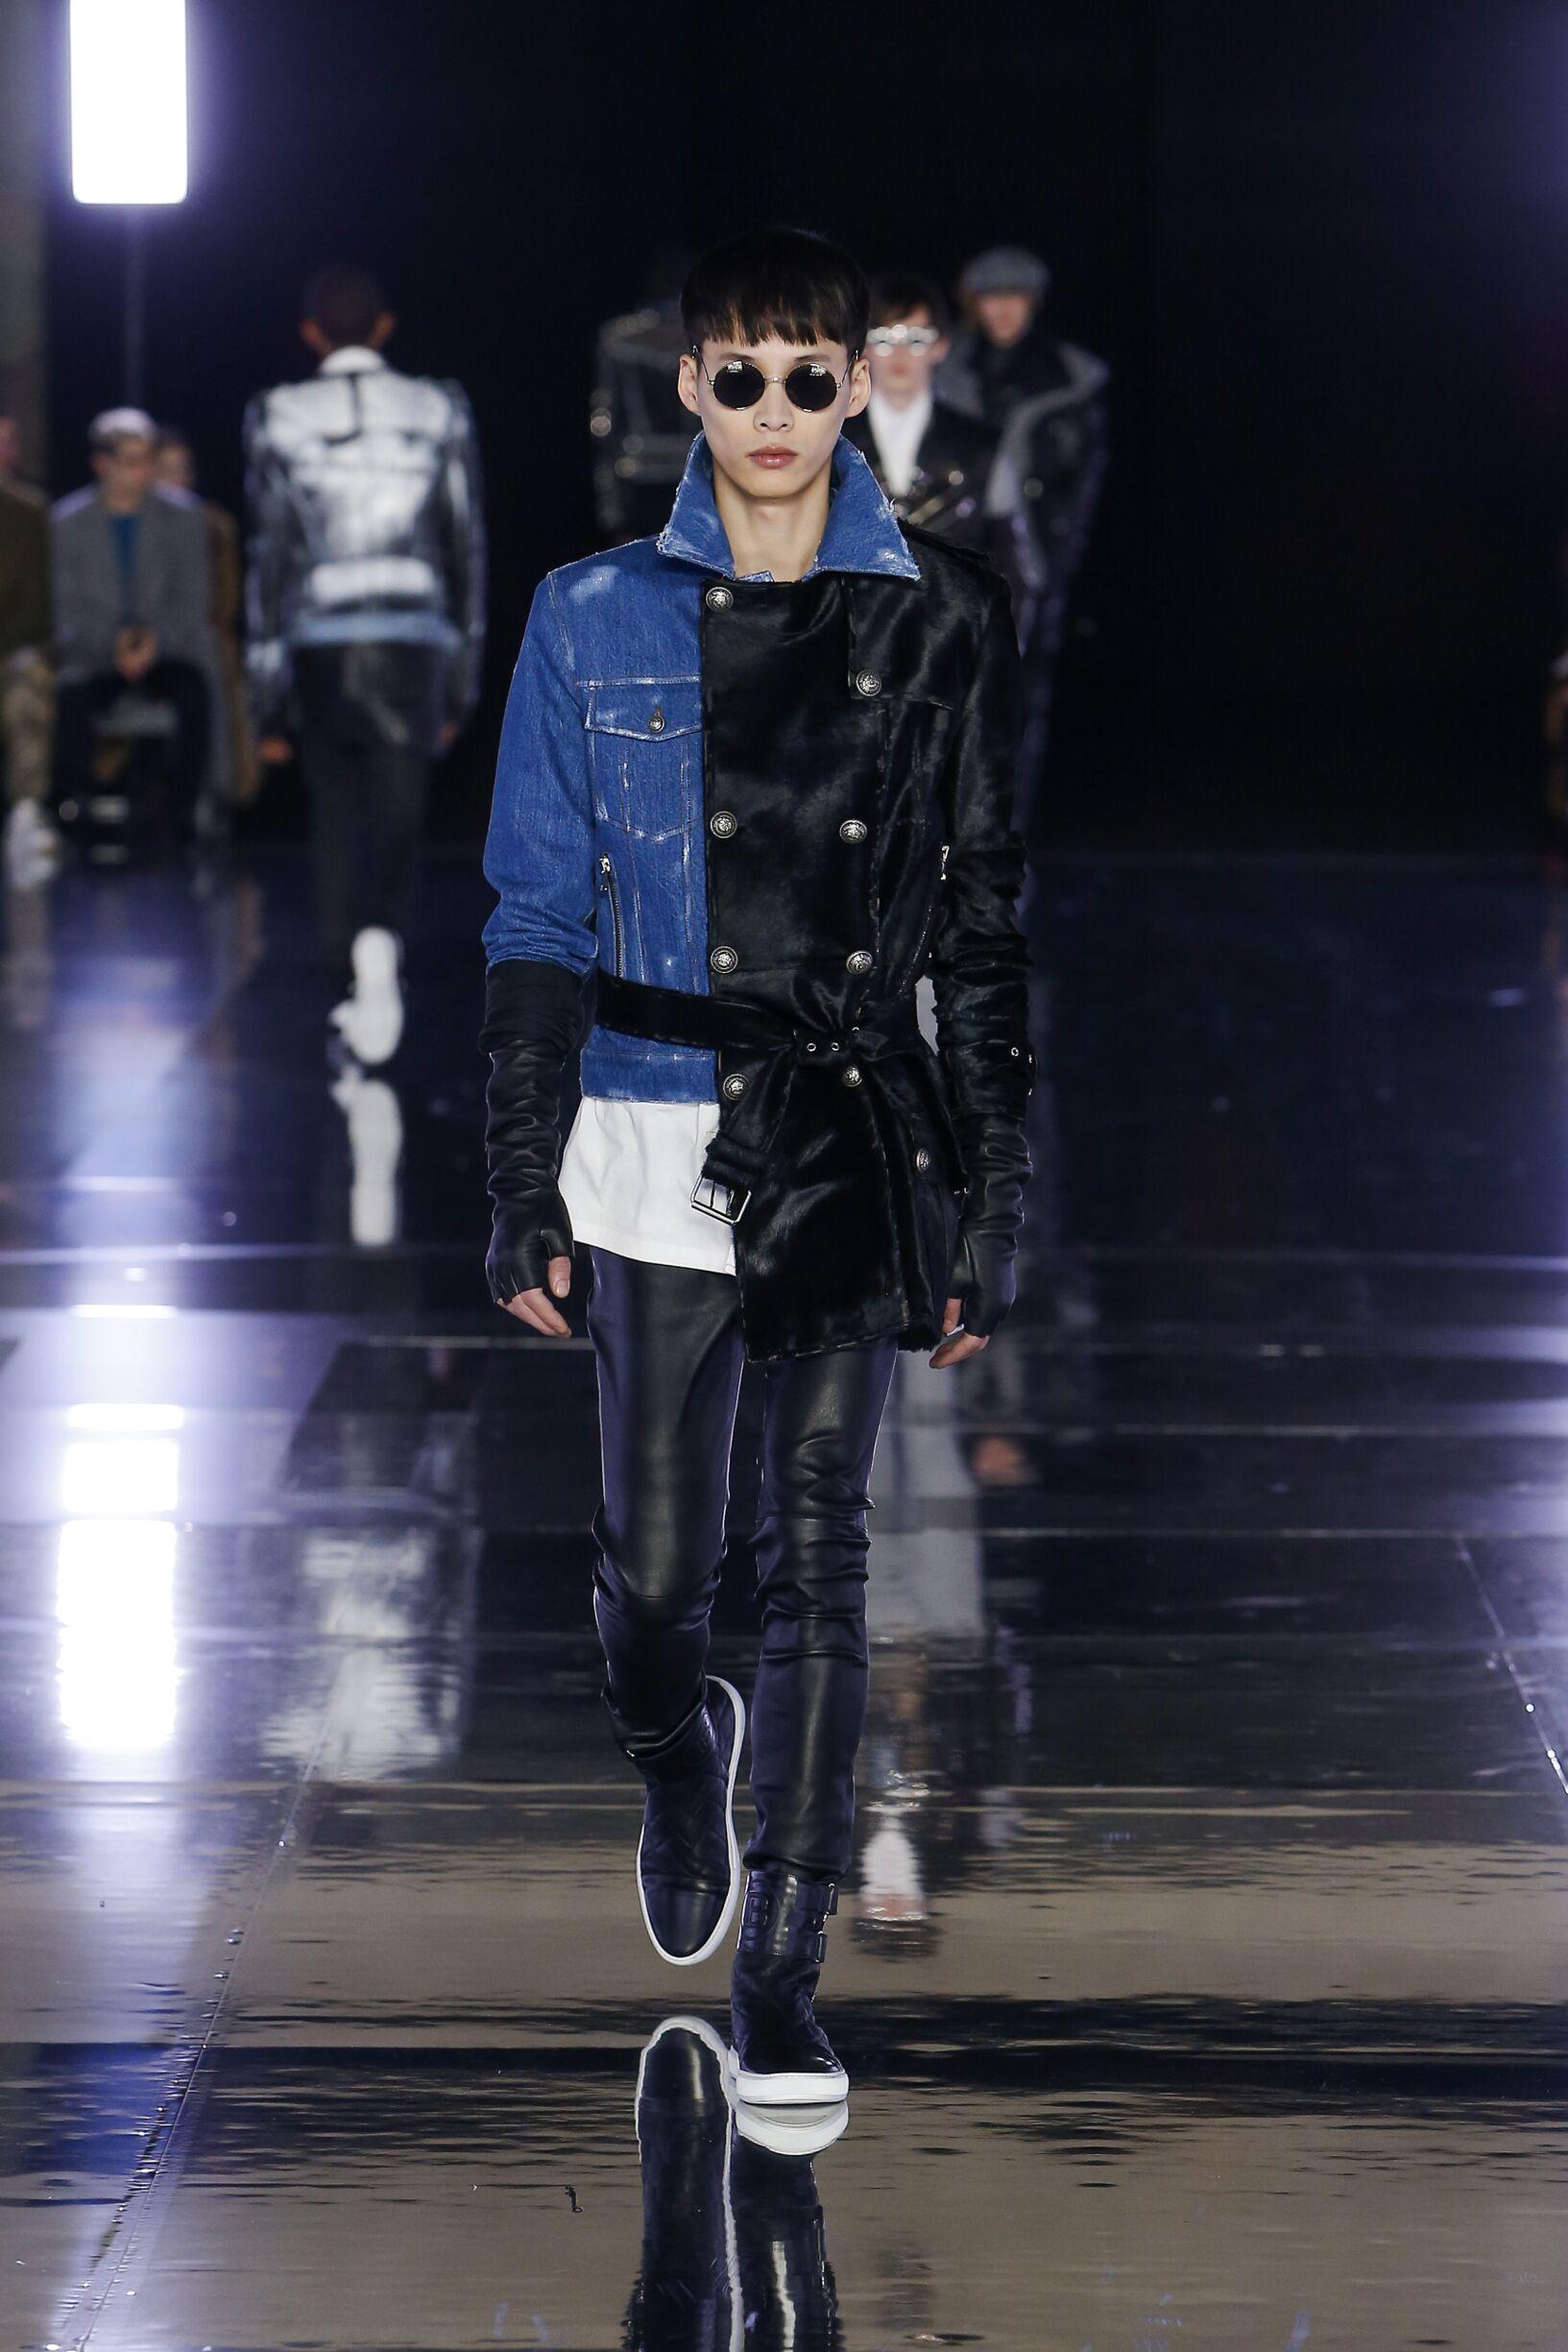 FW 2019 Balmain Show Paris Fashion Week